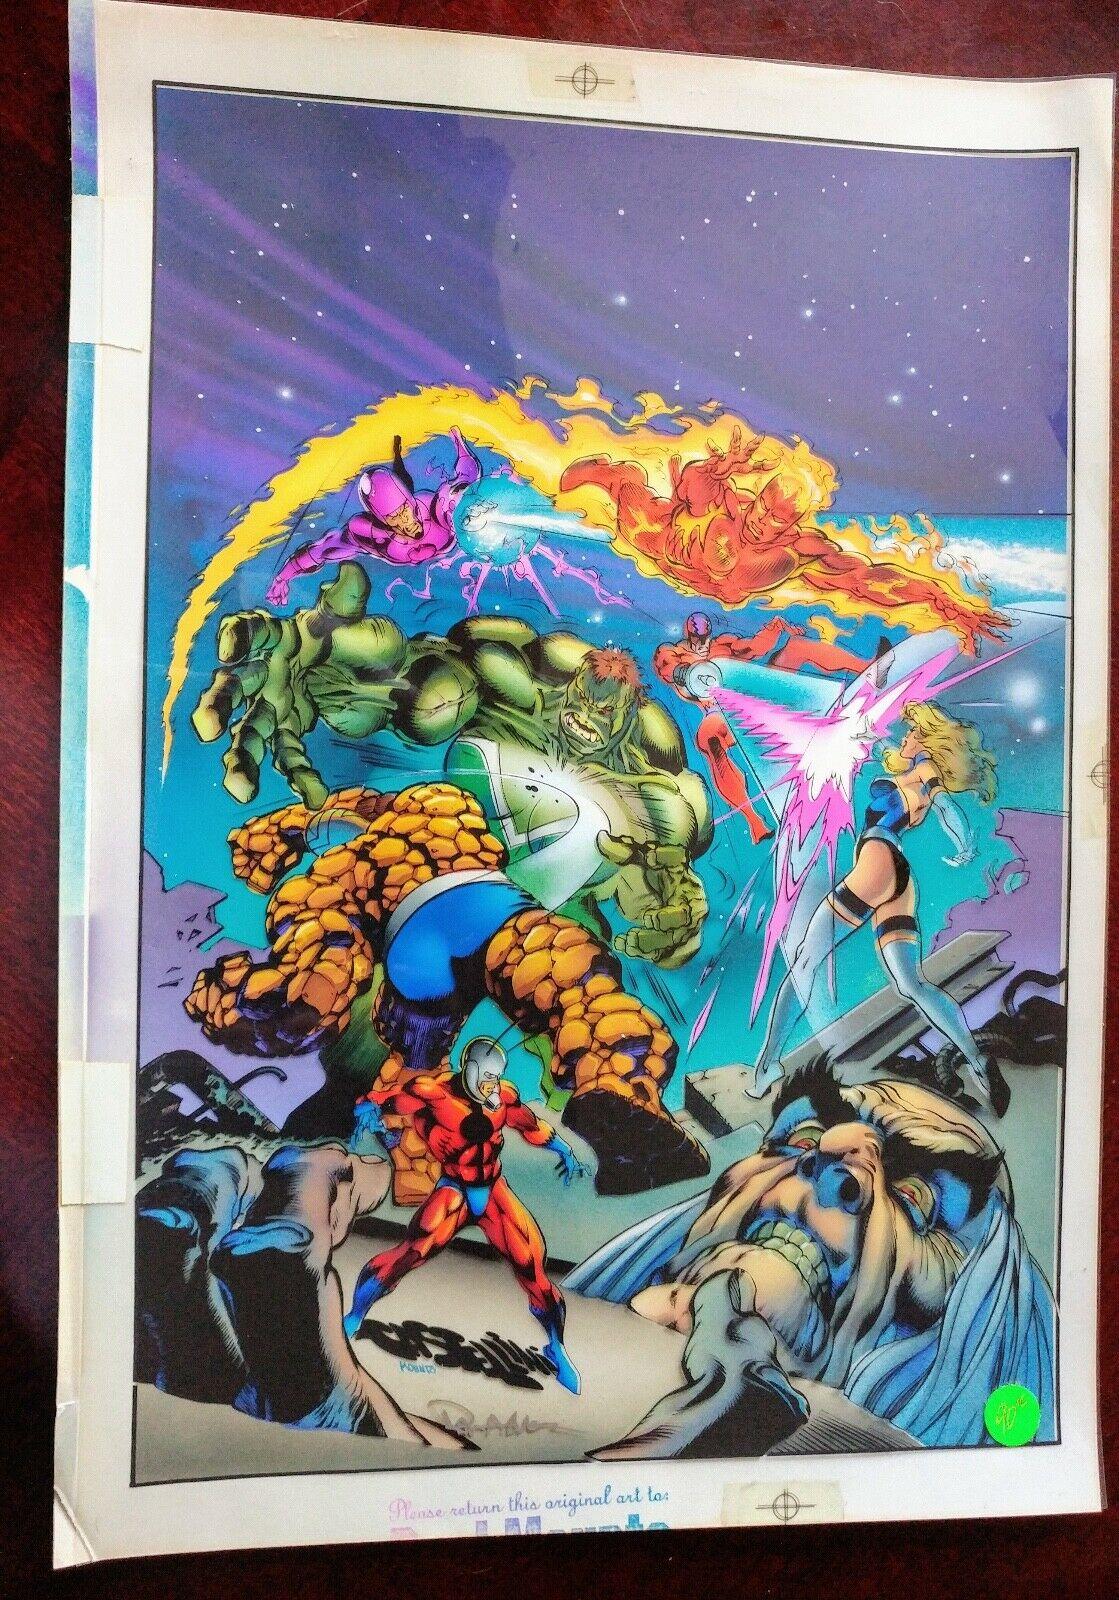 Marvel Fantastic Four Unlimited Original comic book Cover Color Art by Mounts